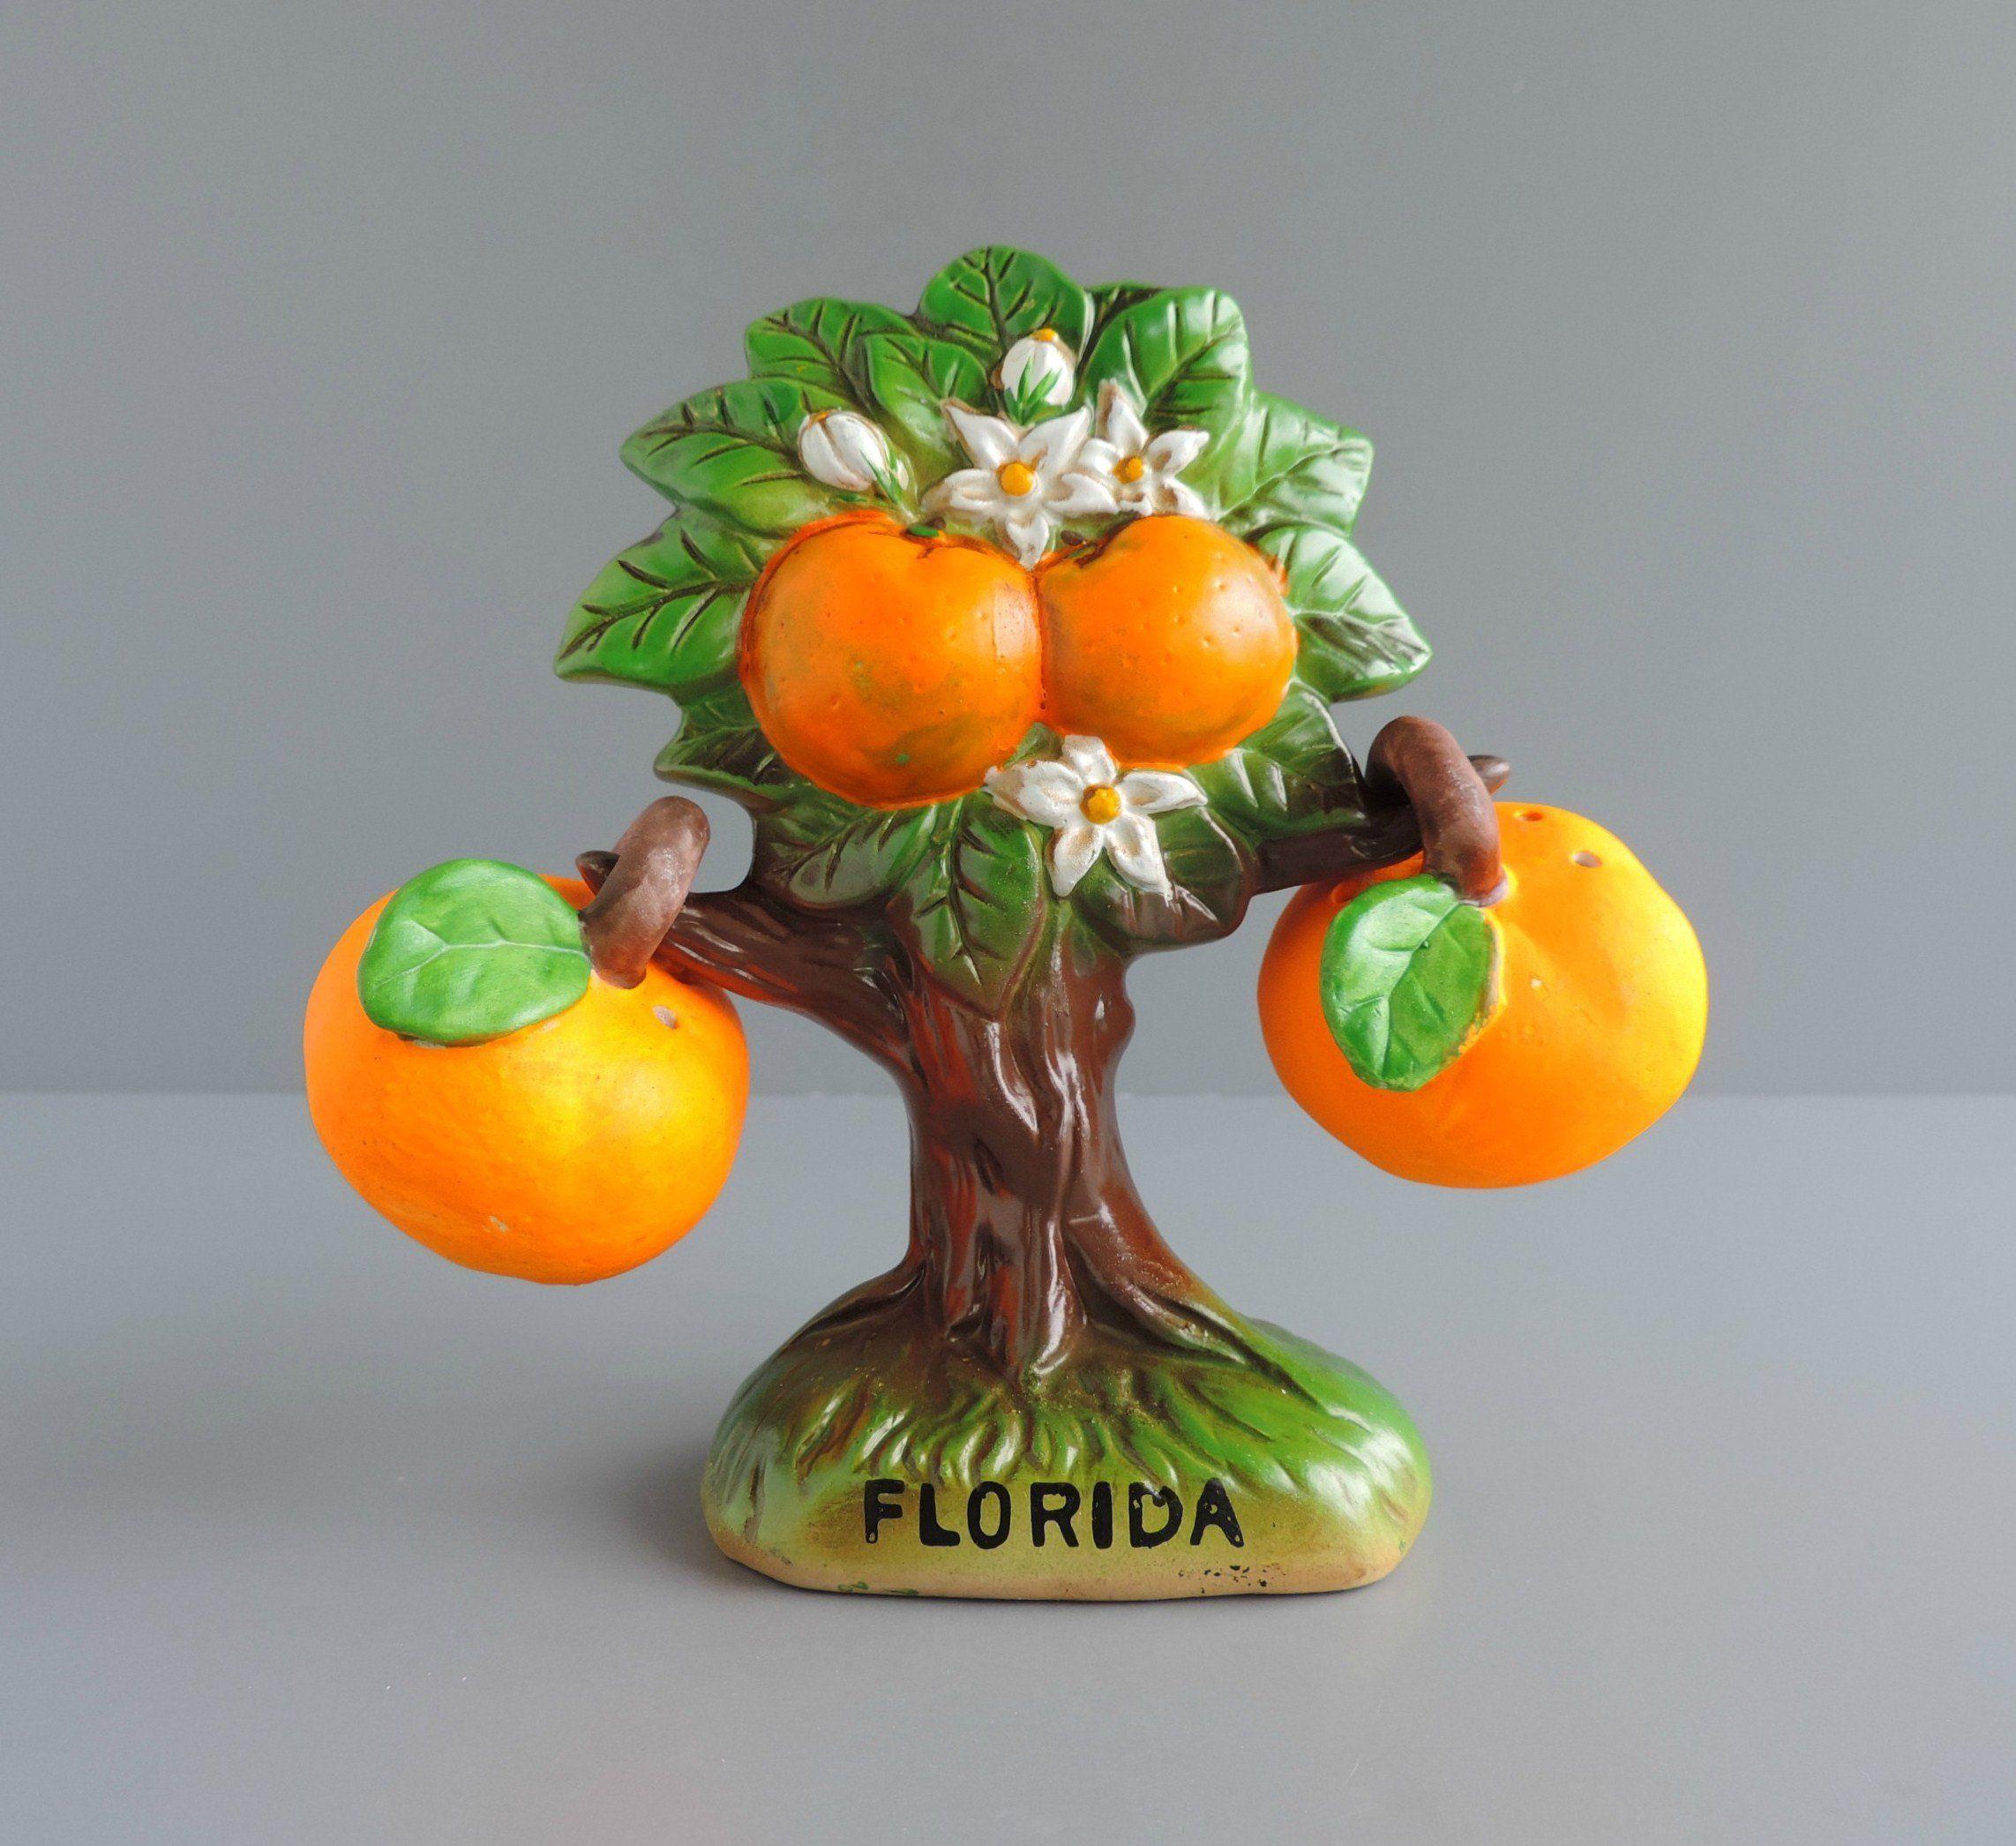 Vintage Florida Orange Tree Salt And Pepper Shaker Set | Novelty Souvenir |  Boho Bohemian Kitchen Decor By TheLogChateau On Etsy